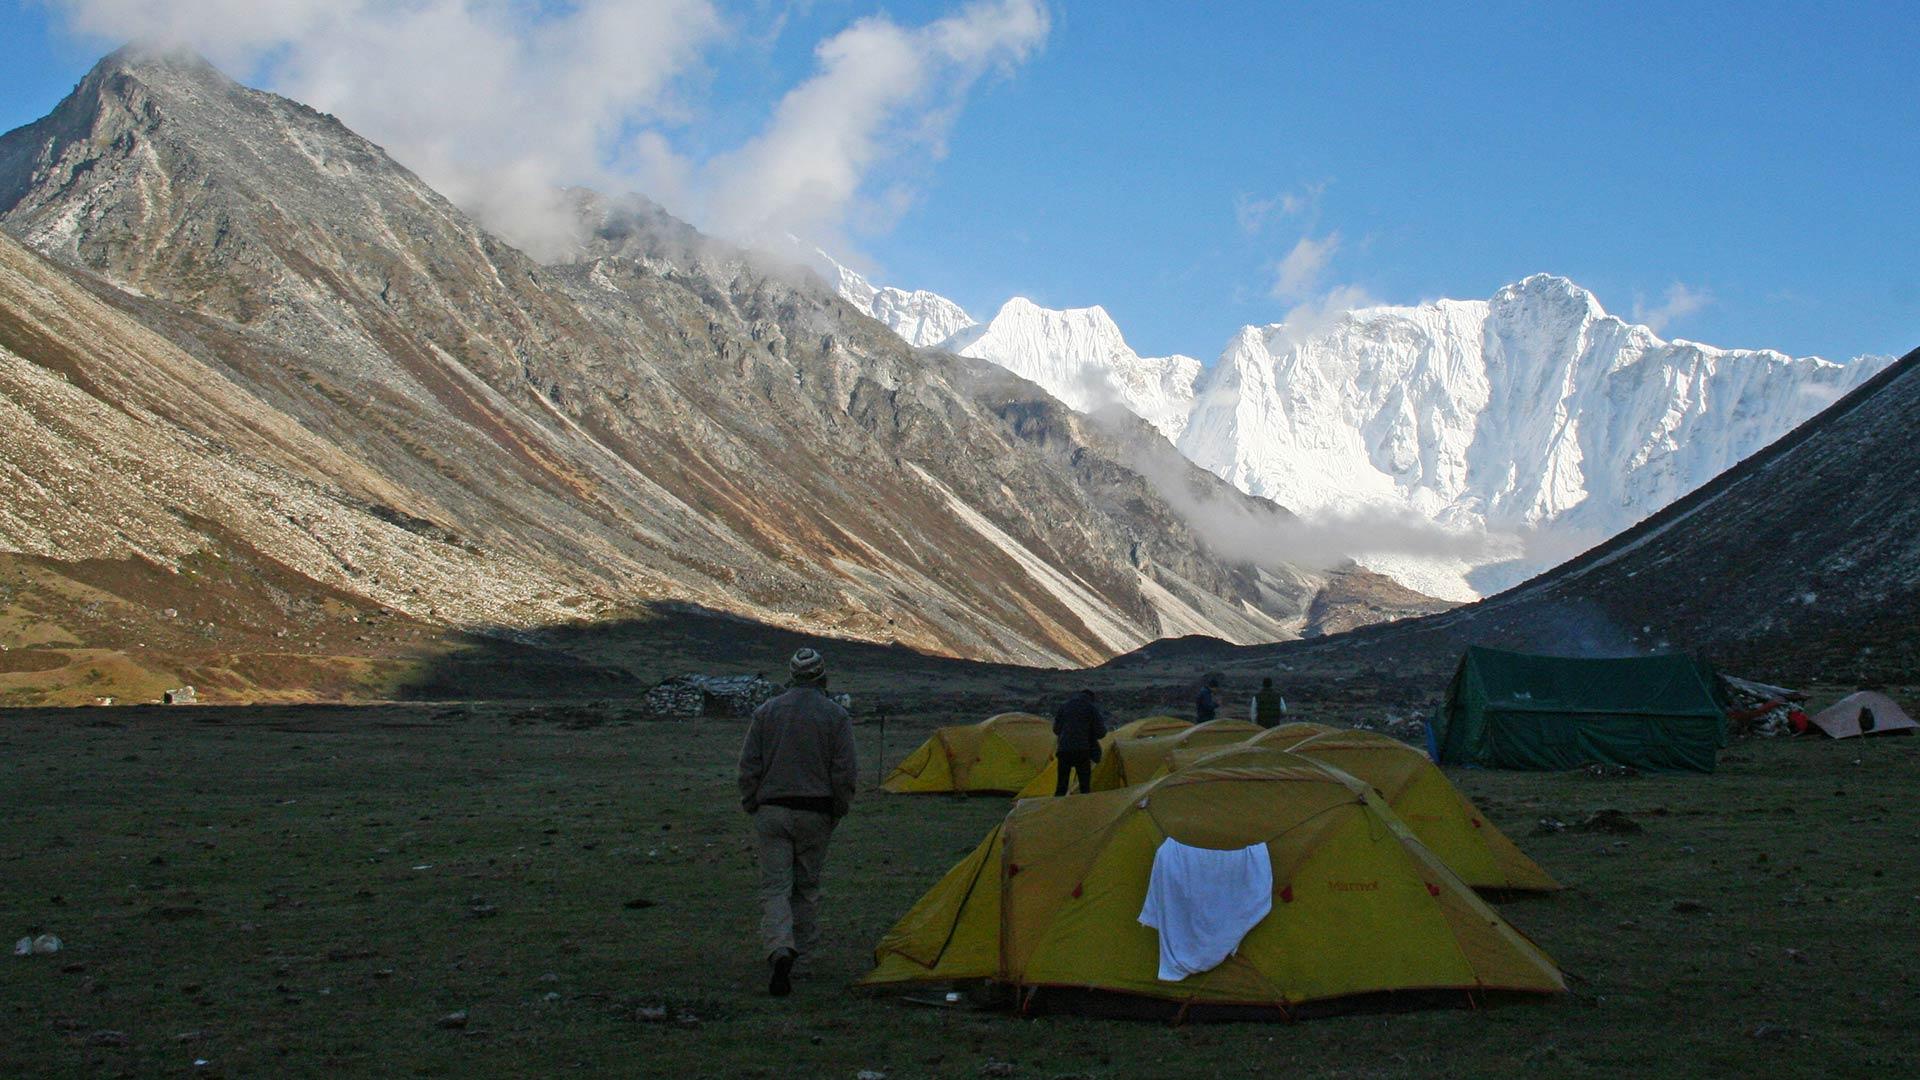 Tents at Barmarpa Camp along the Gangkhar Puensum trek in Bhutan